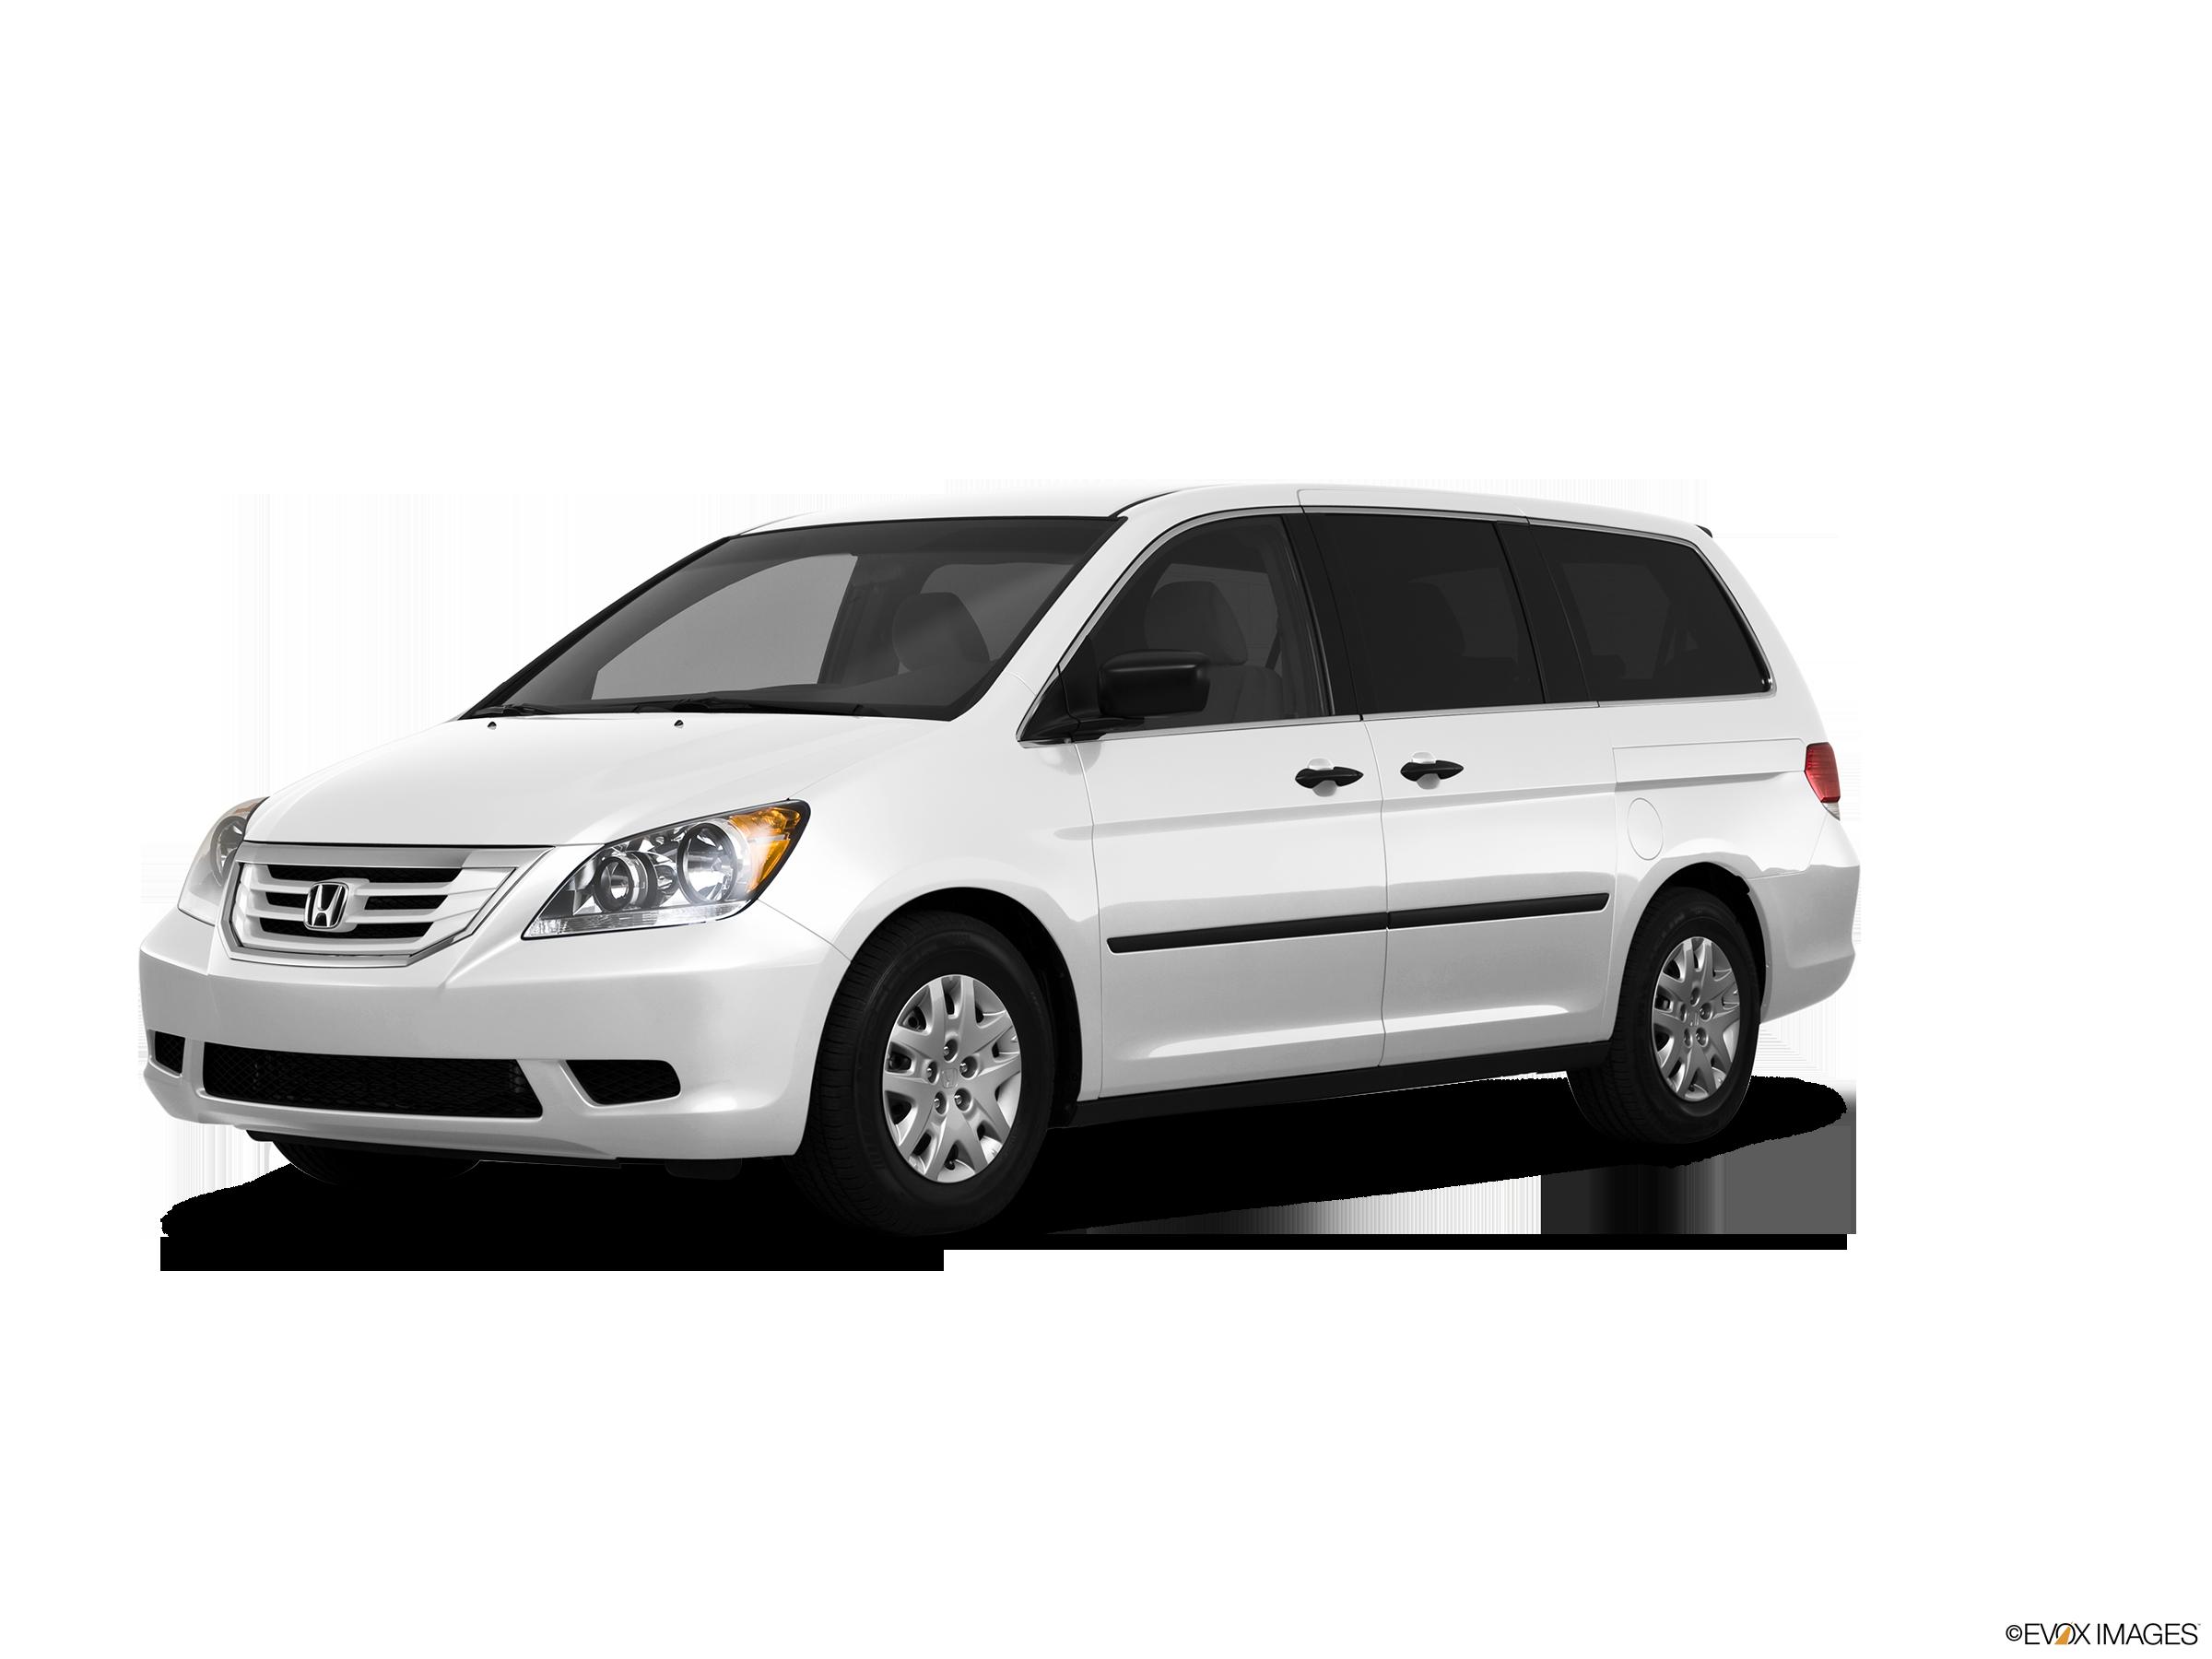 2010 Honda Odyssey Values Cars For Sale Kelley Blue Book